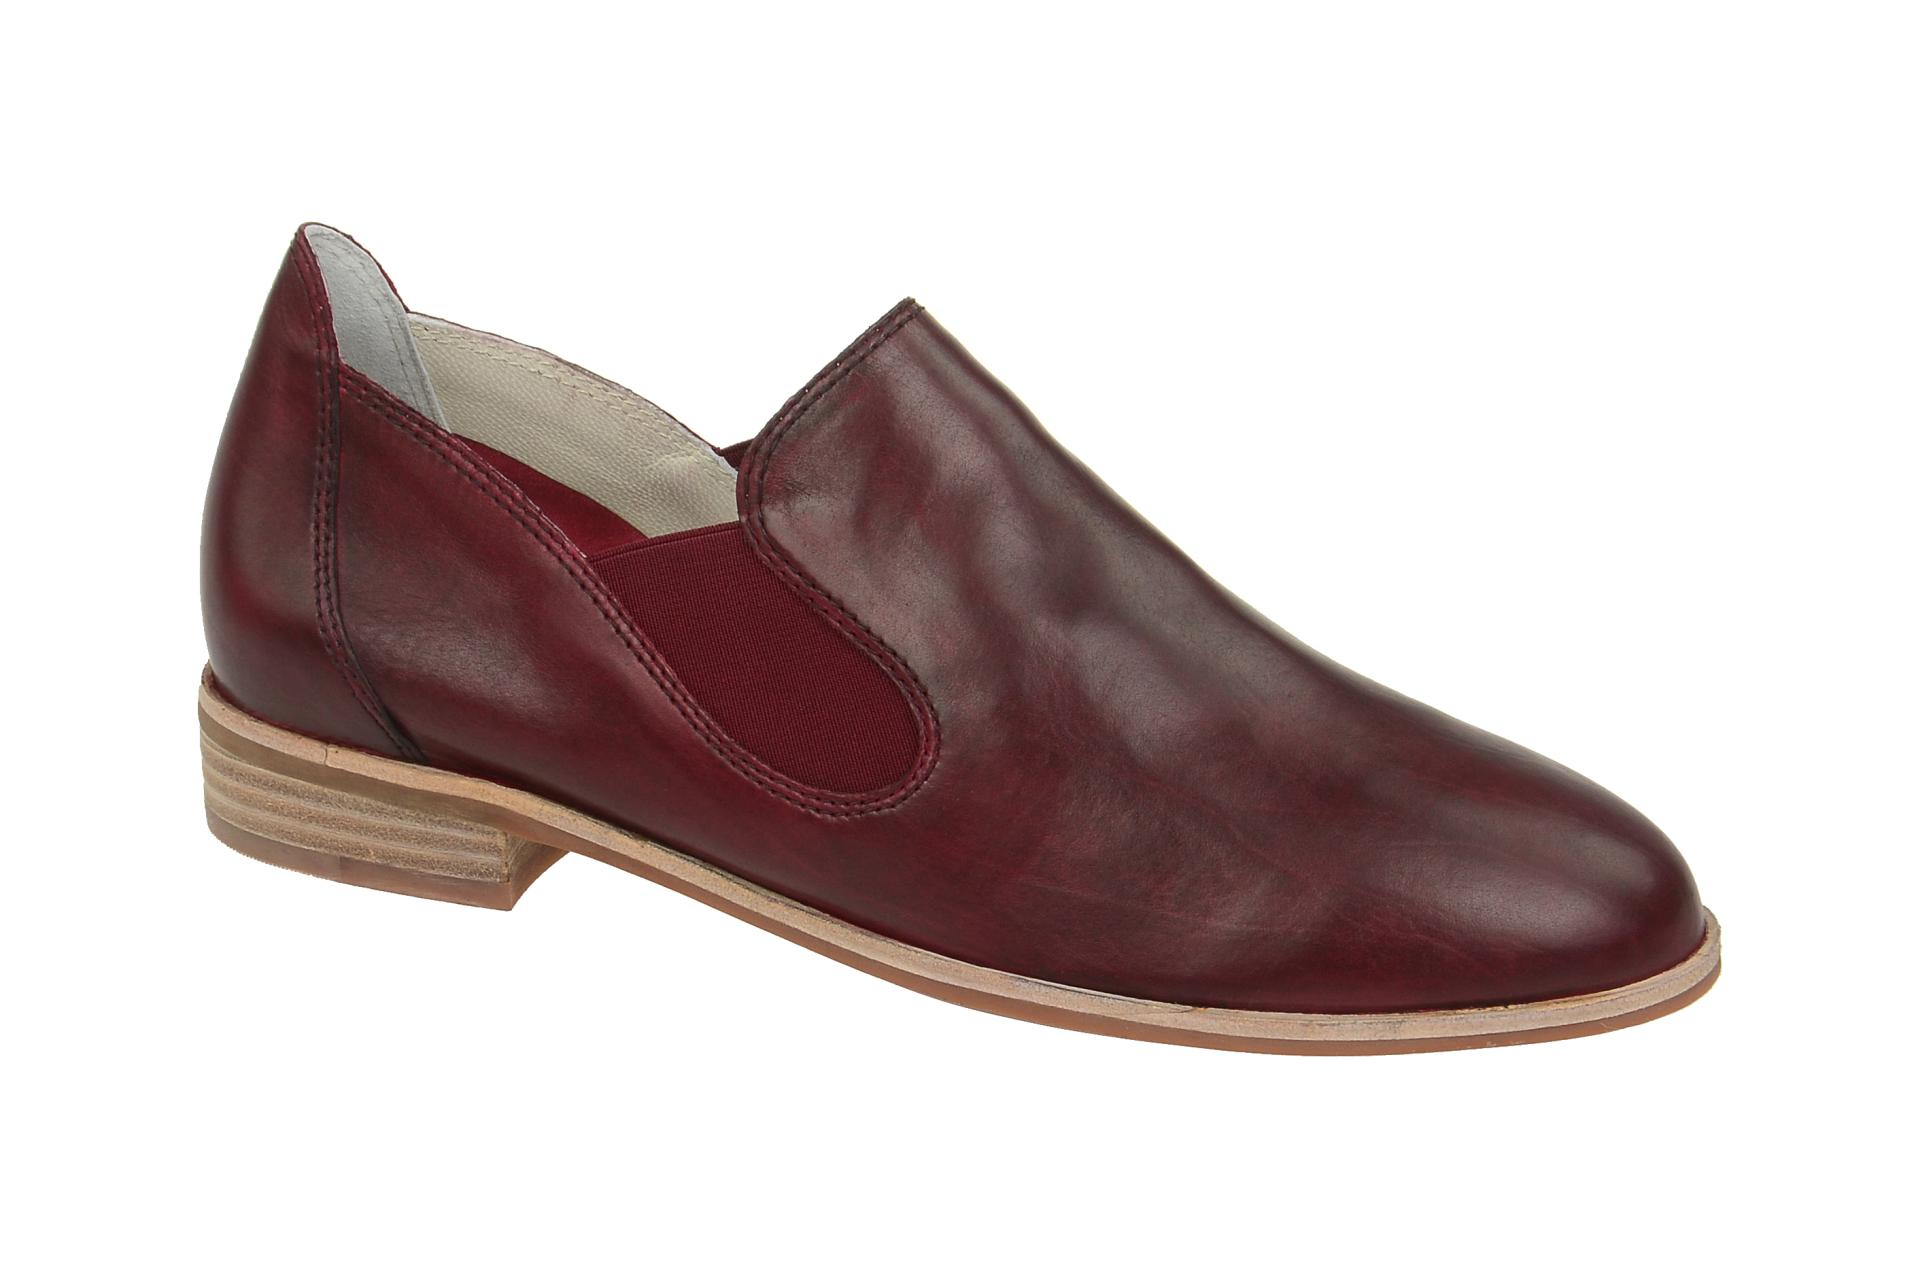 the latest 6287c 9590c Details zu Everybody Schuhe 30504G2365 rot Damenschuhe elegante Slipper  30504G2365 sangria